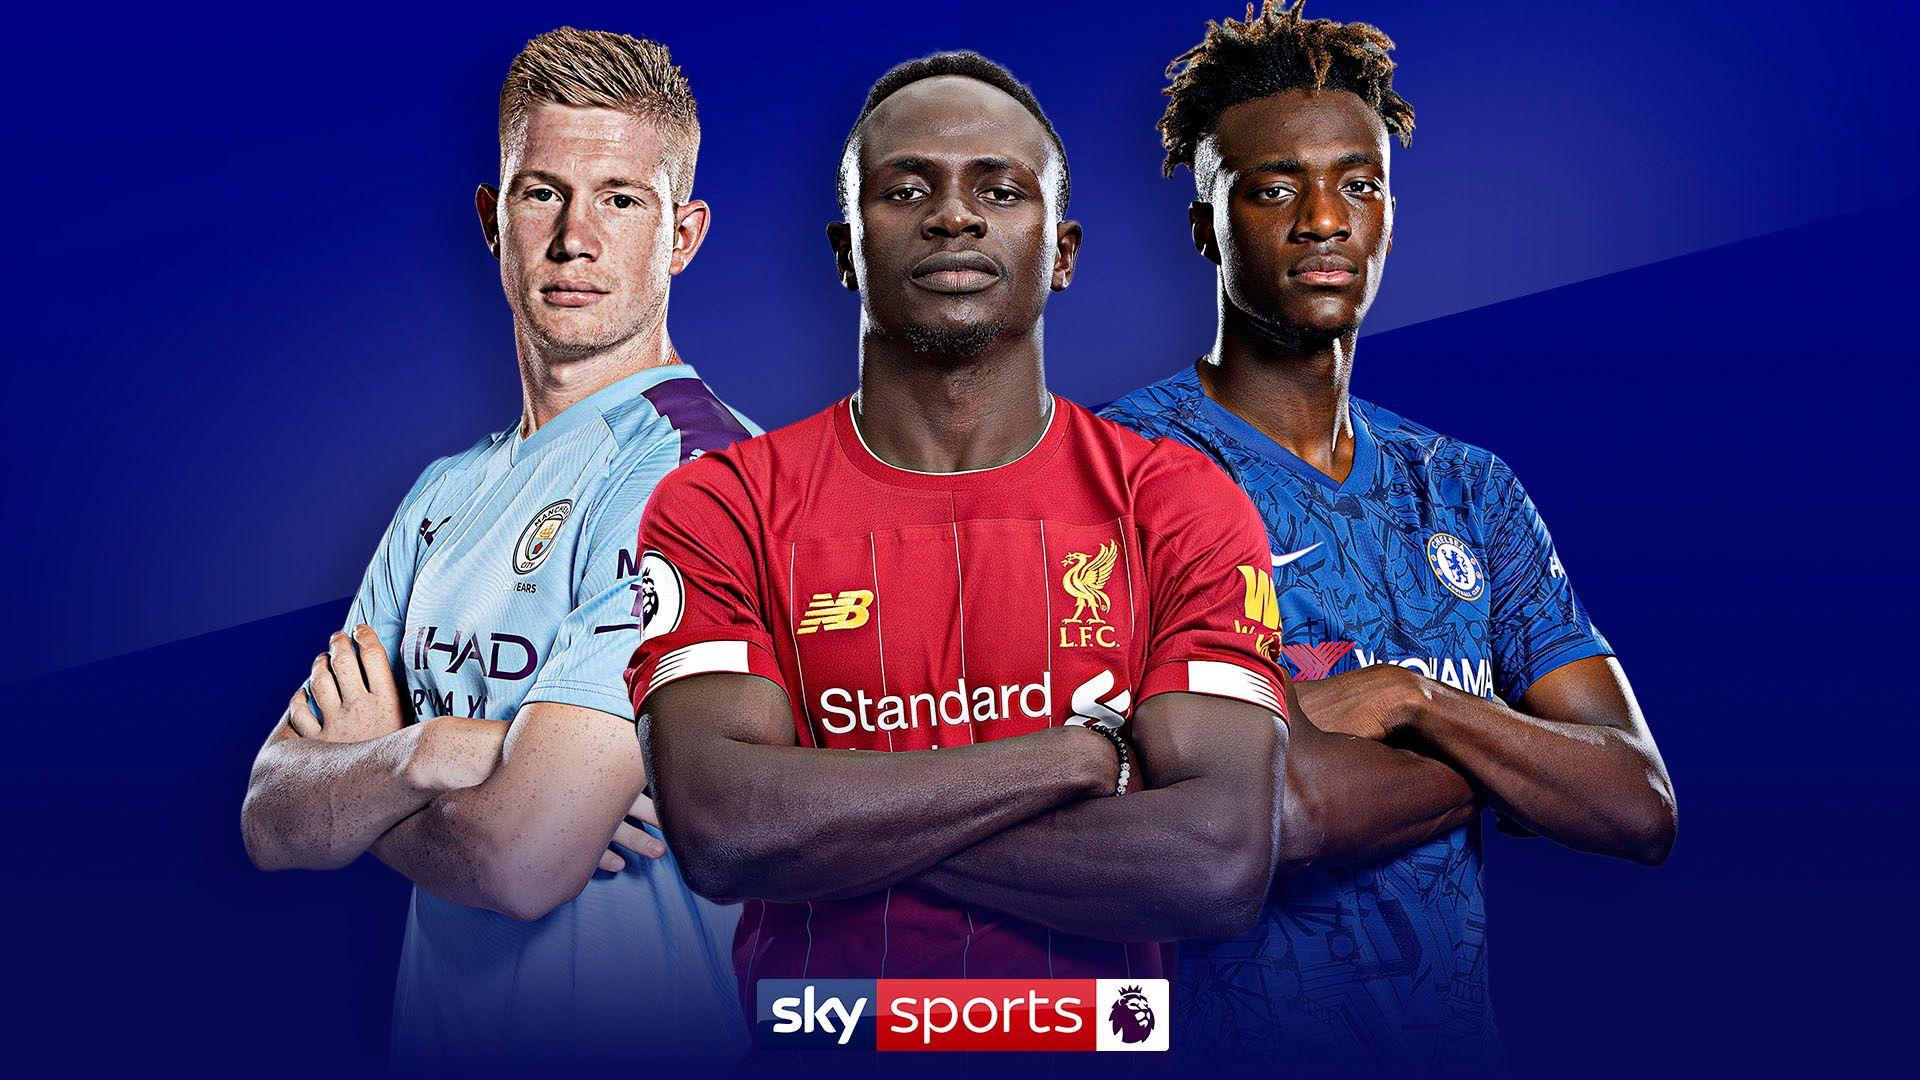 Premier League restart: The live games on Sky